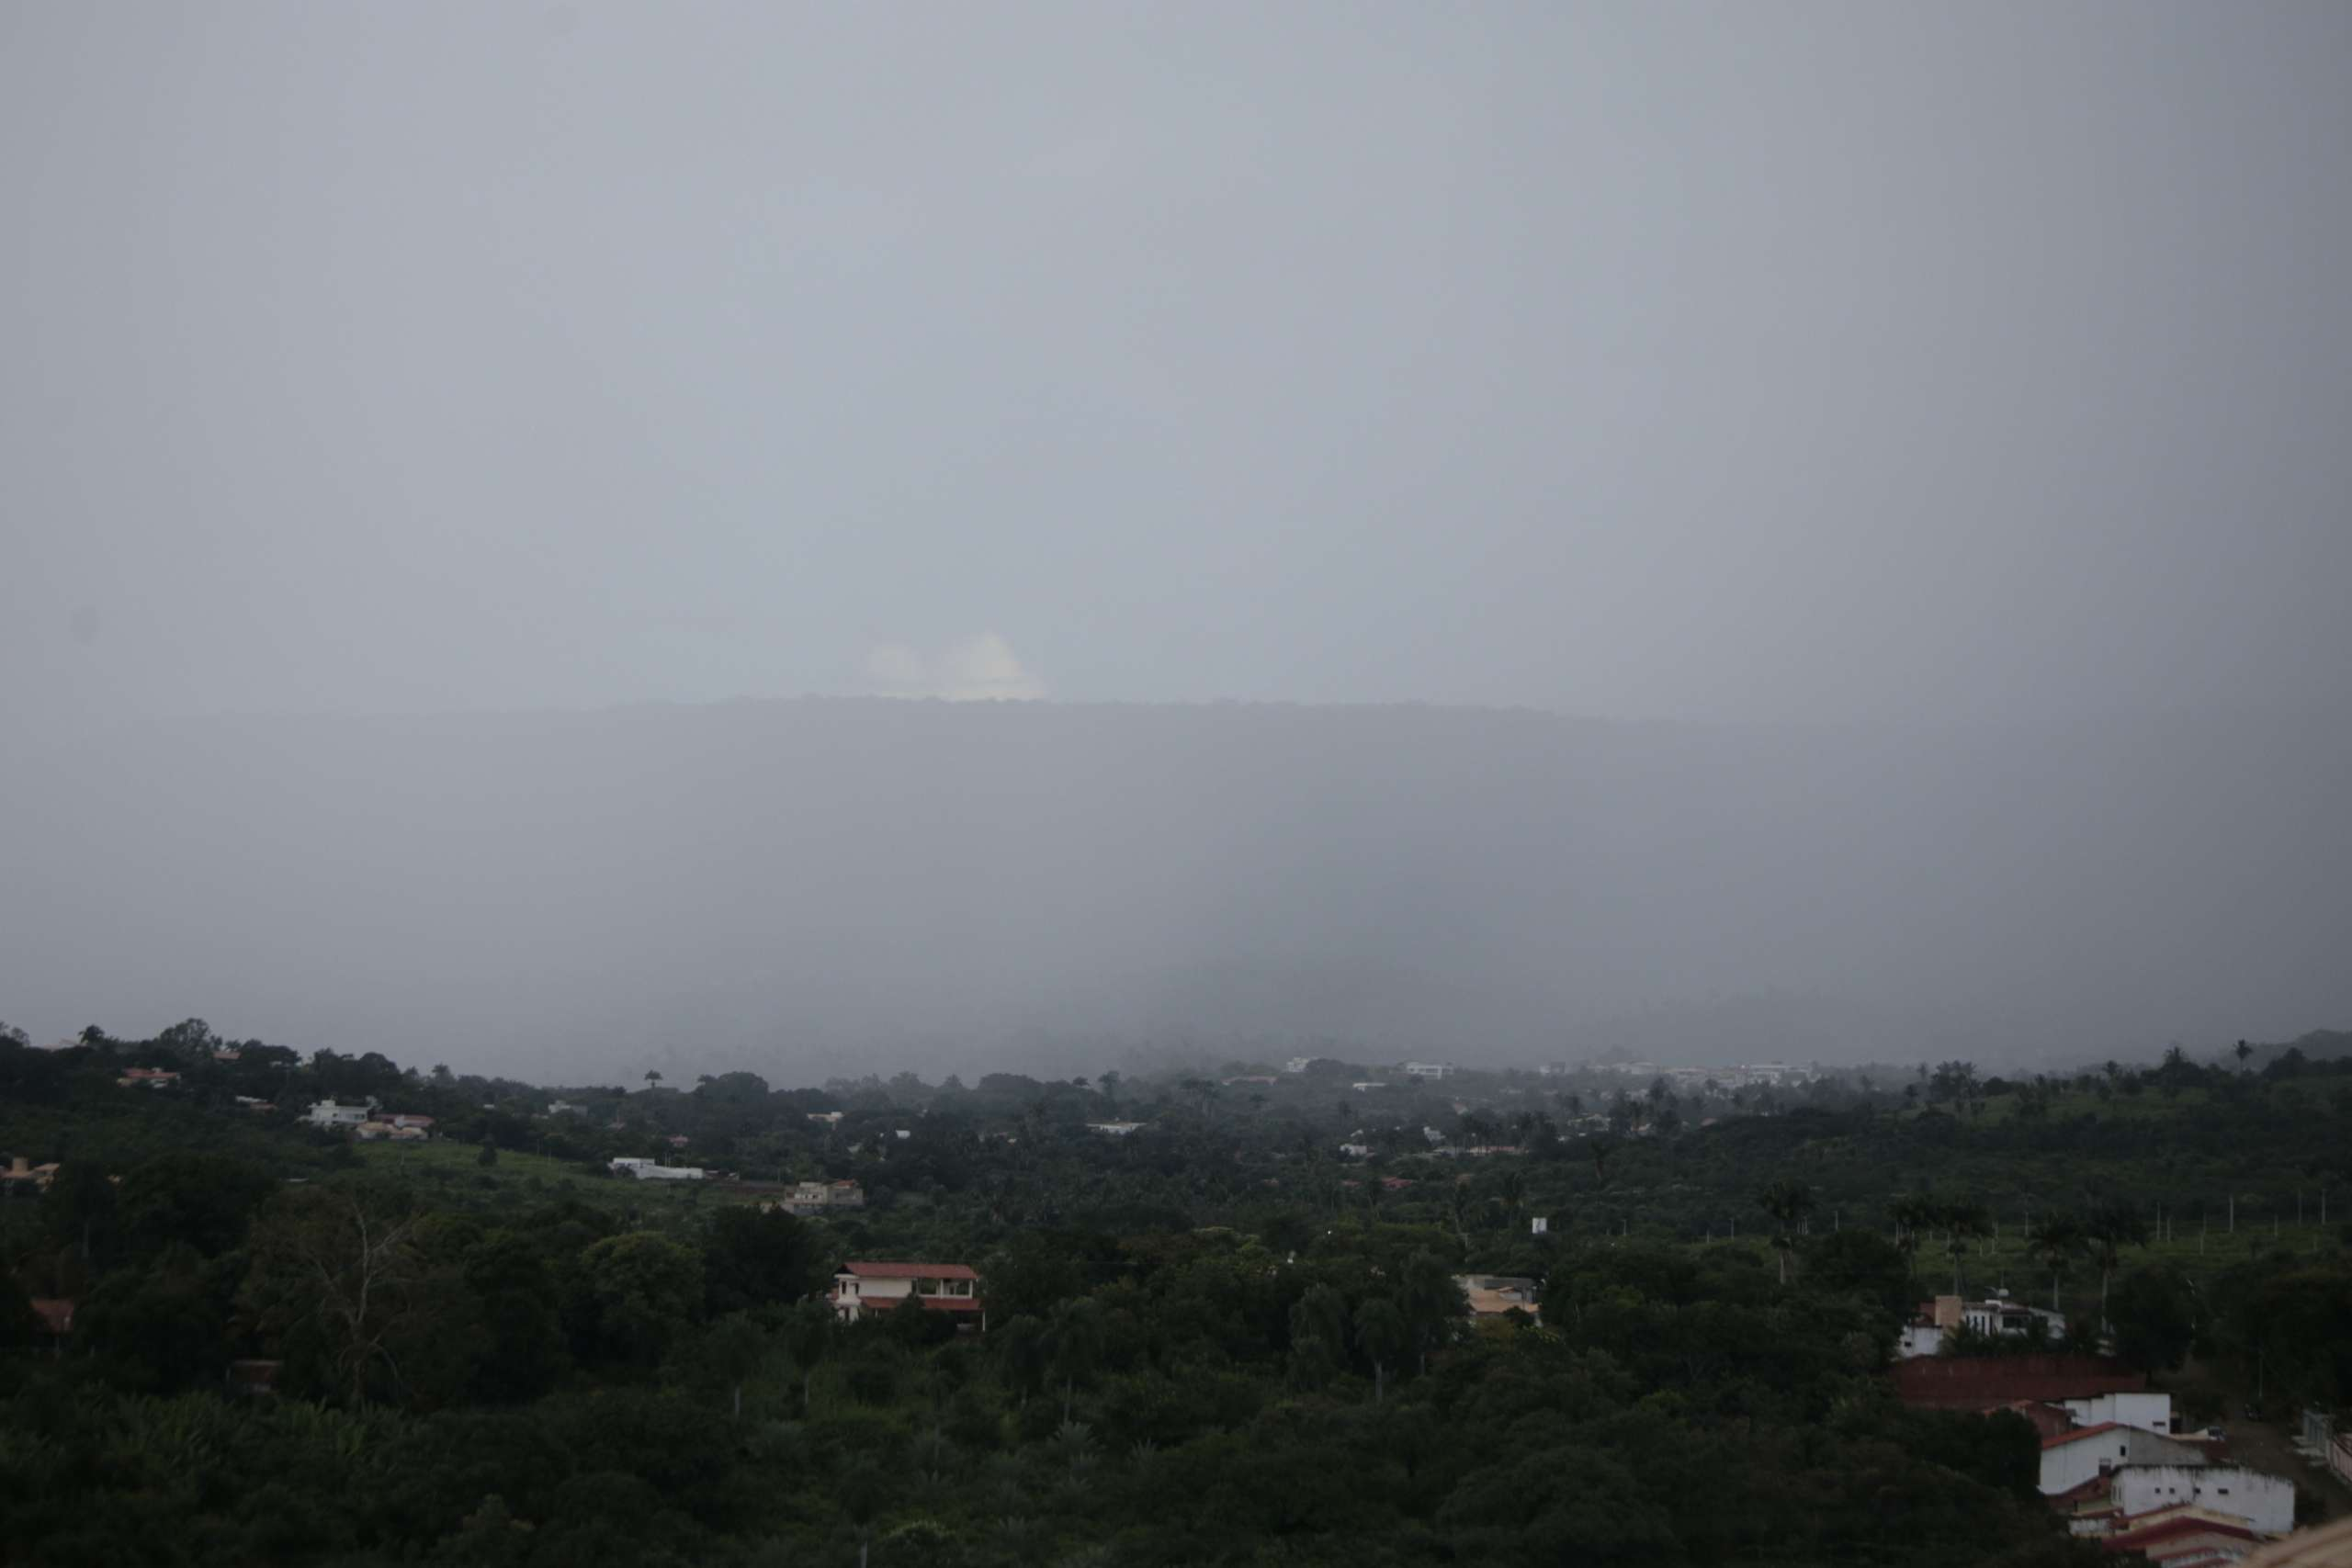 Prognóstico indica 50% de probabilidade para chuvas abaixo da média no Ceará entre fevereiro e abril